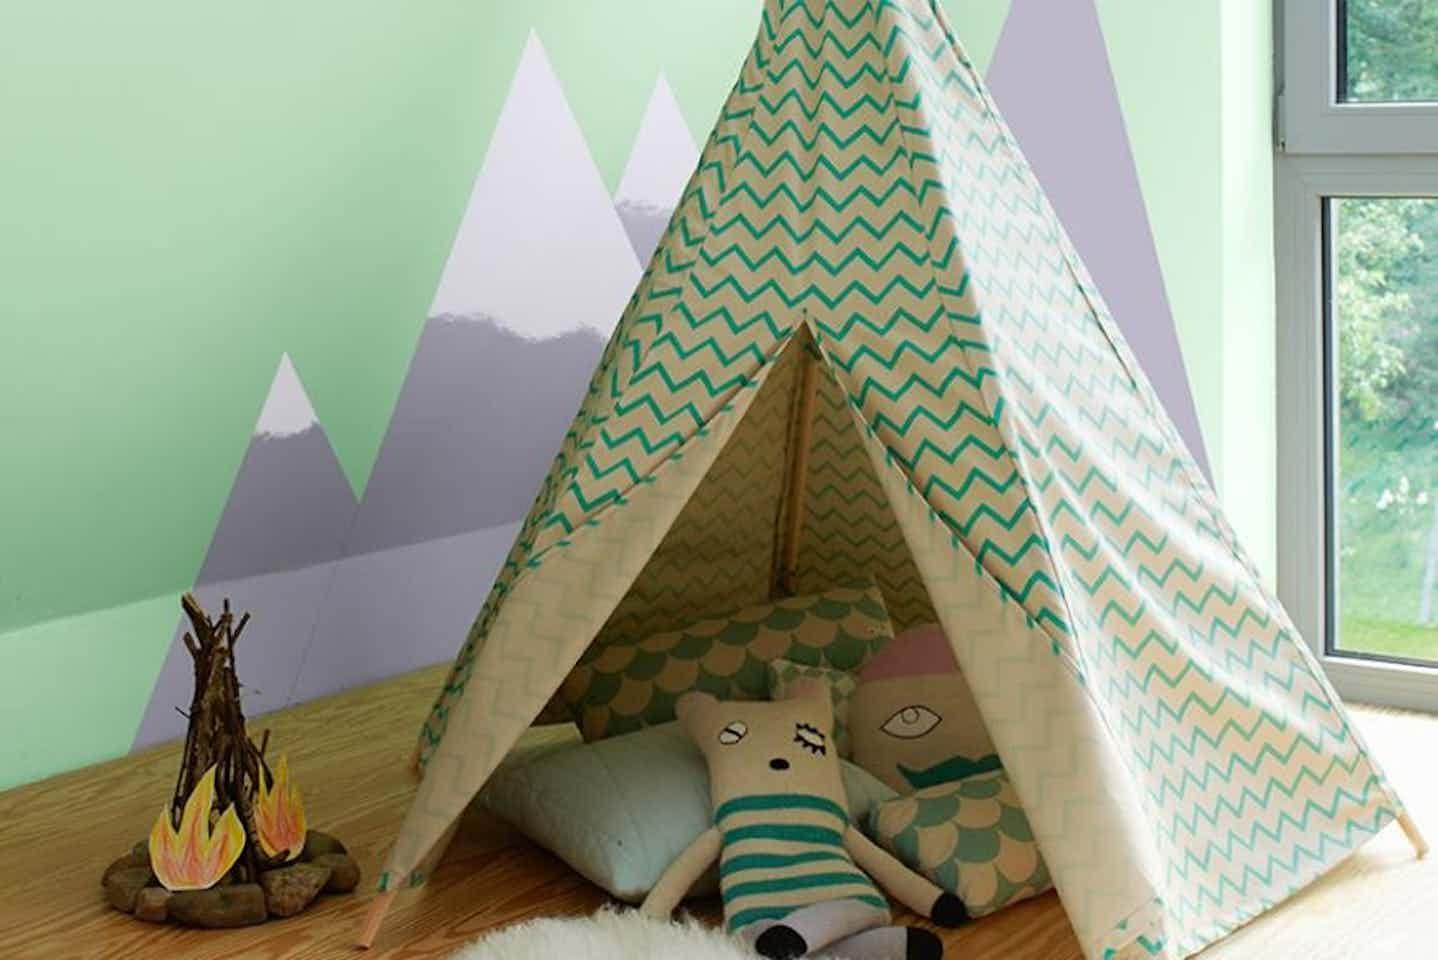 Alpina Kinderzimmerfarbe, Grüne Wandfarbe mit Wandbild innen